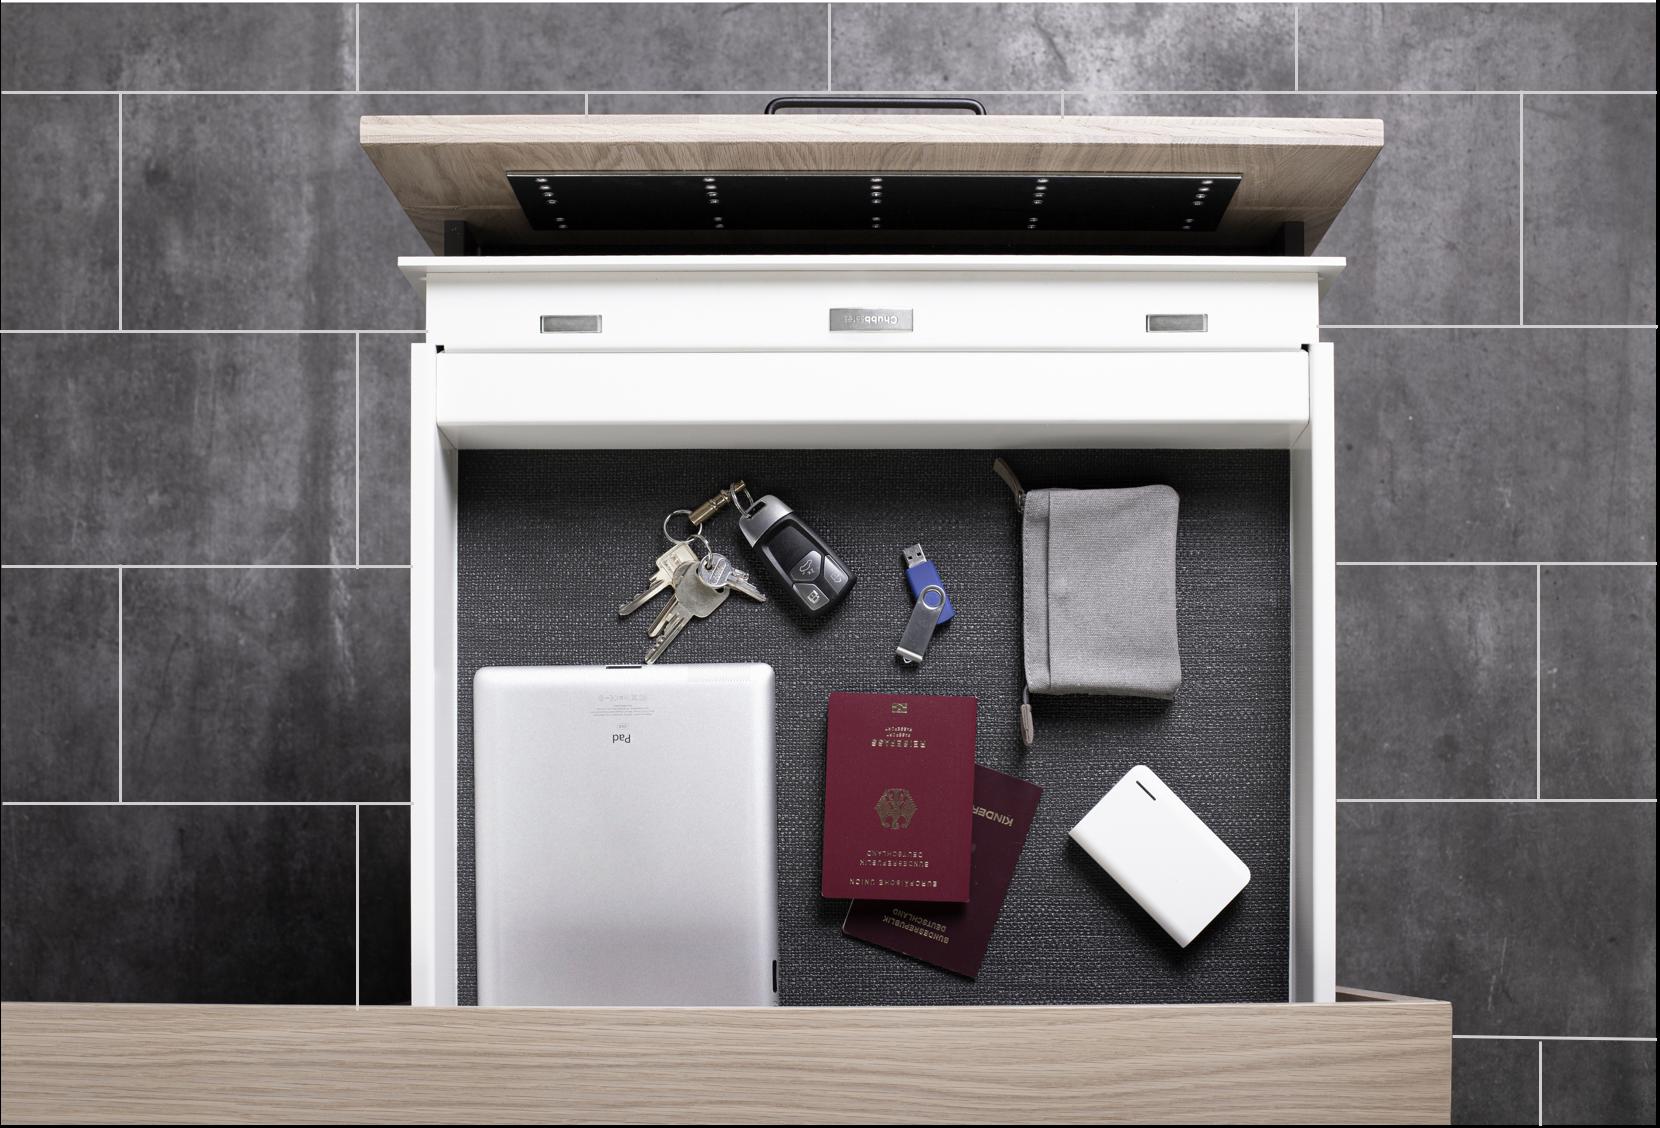 EverydaySafe™ mounted in a kitchen drawer